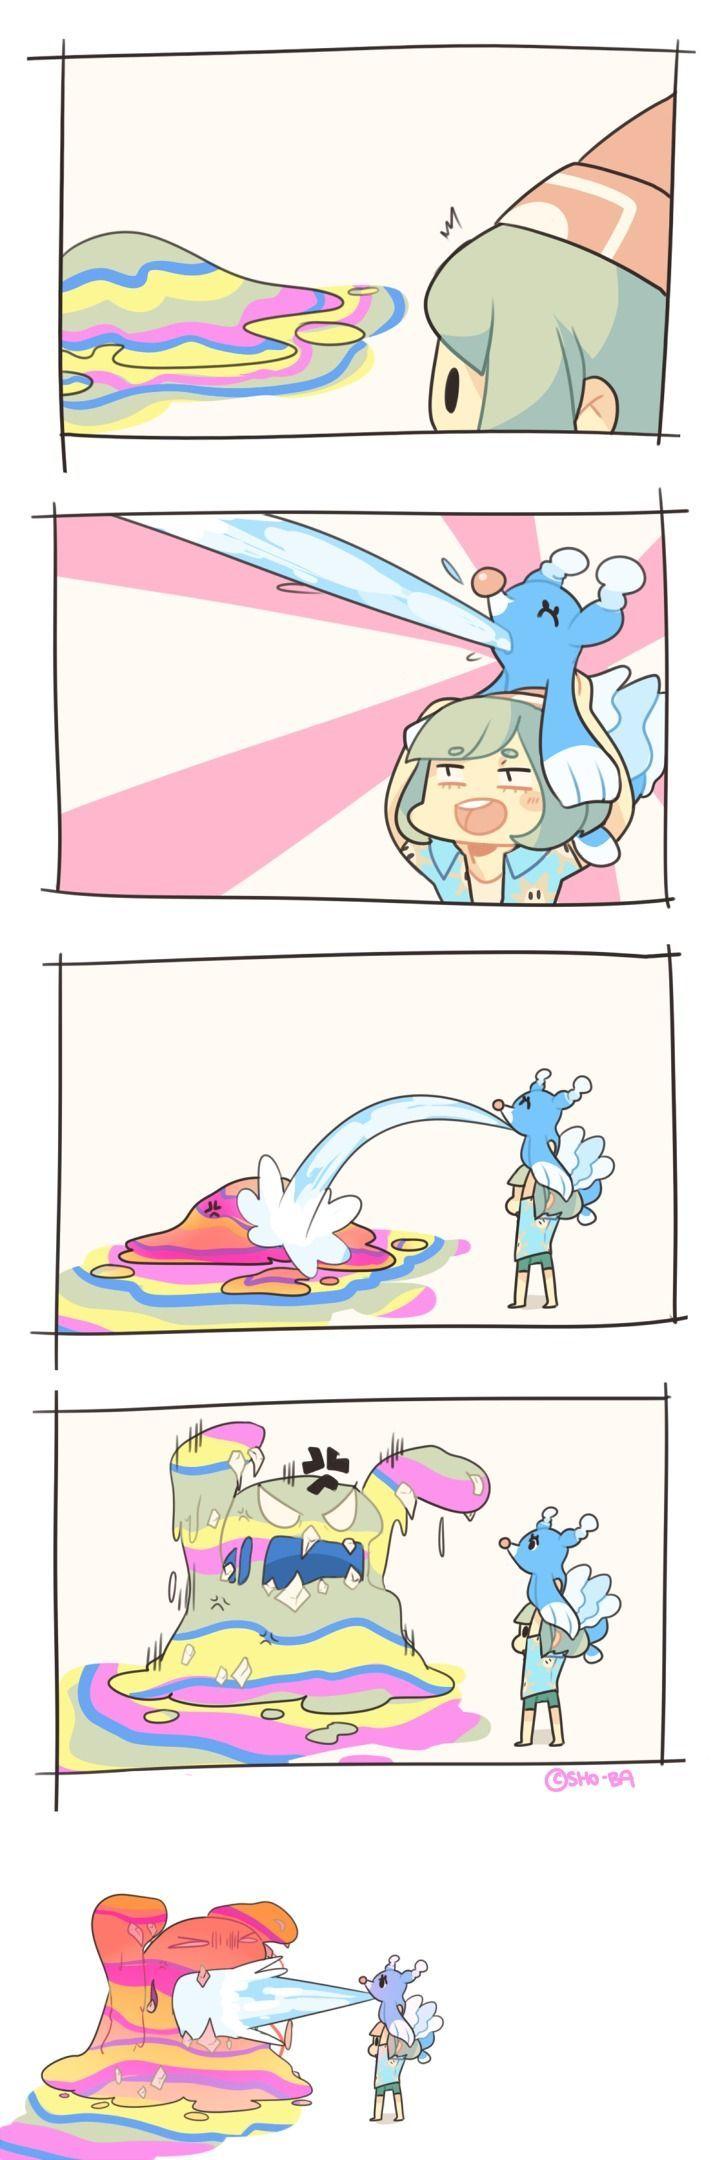 """Pokemon Sun and Moon X Super Mario Sunshine"""